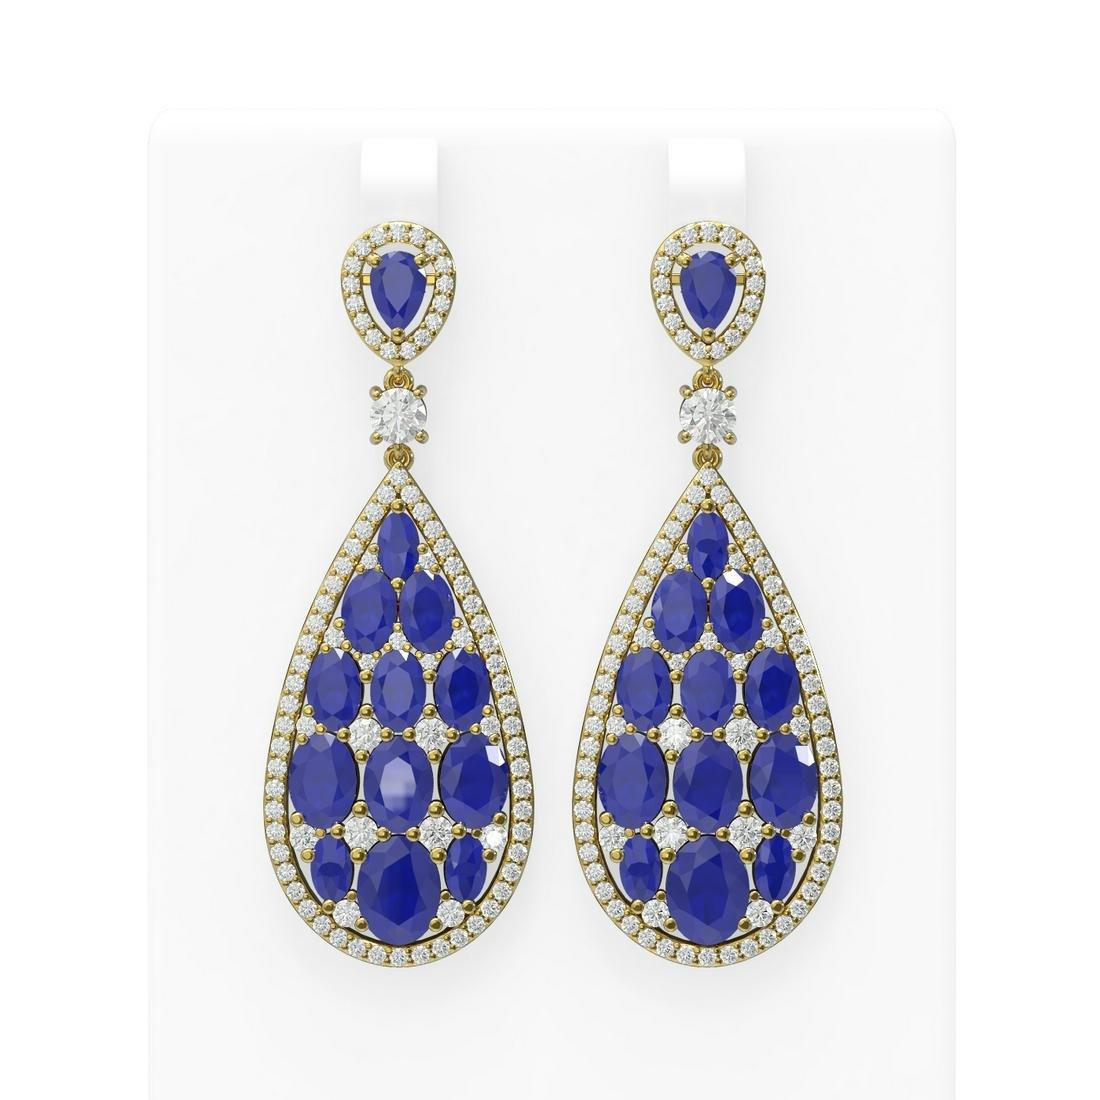 27.47 ctw Sapphire & Diamond Earrings 18K Yellow Gold -